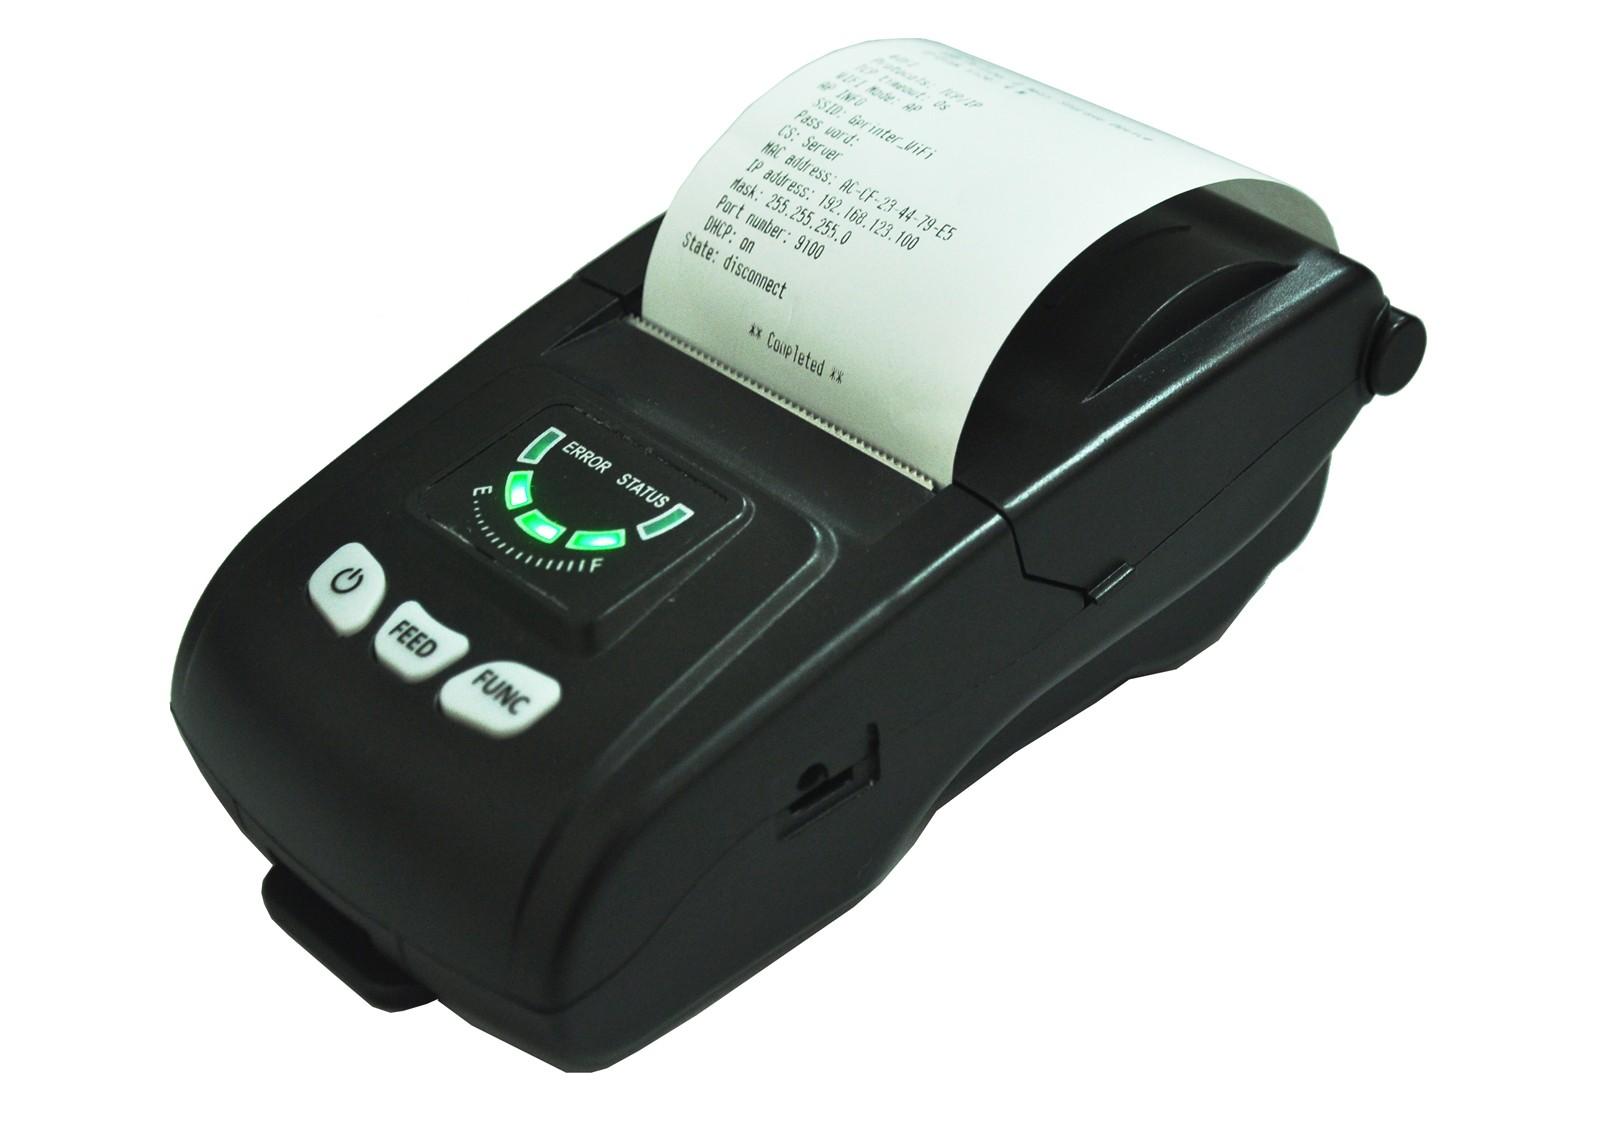 Portable Printer PT-280